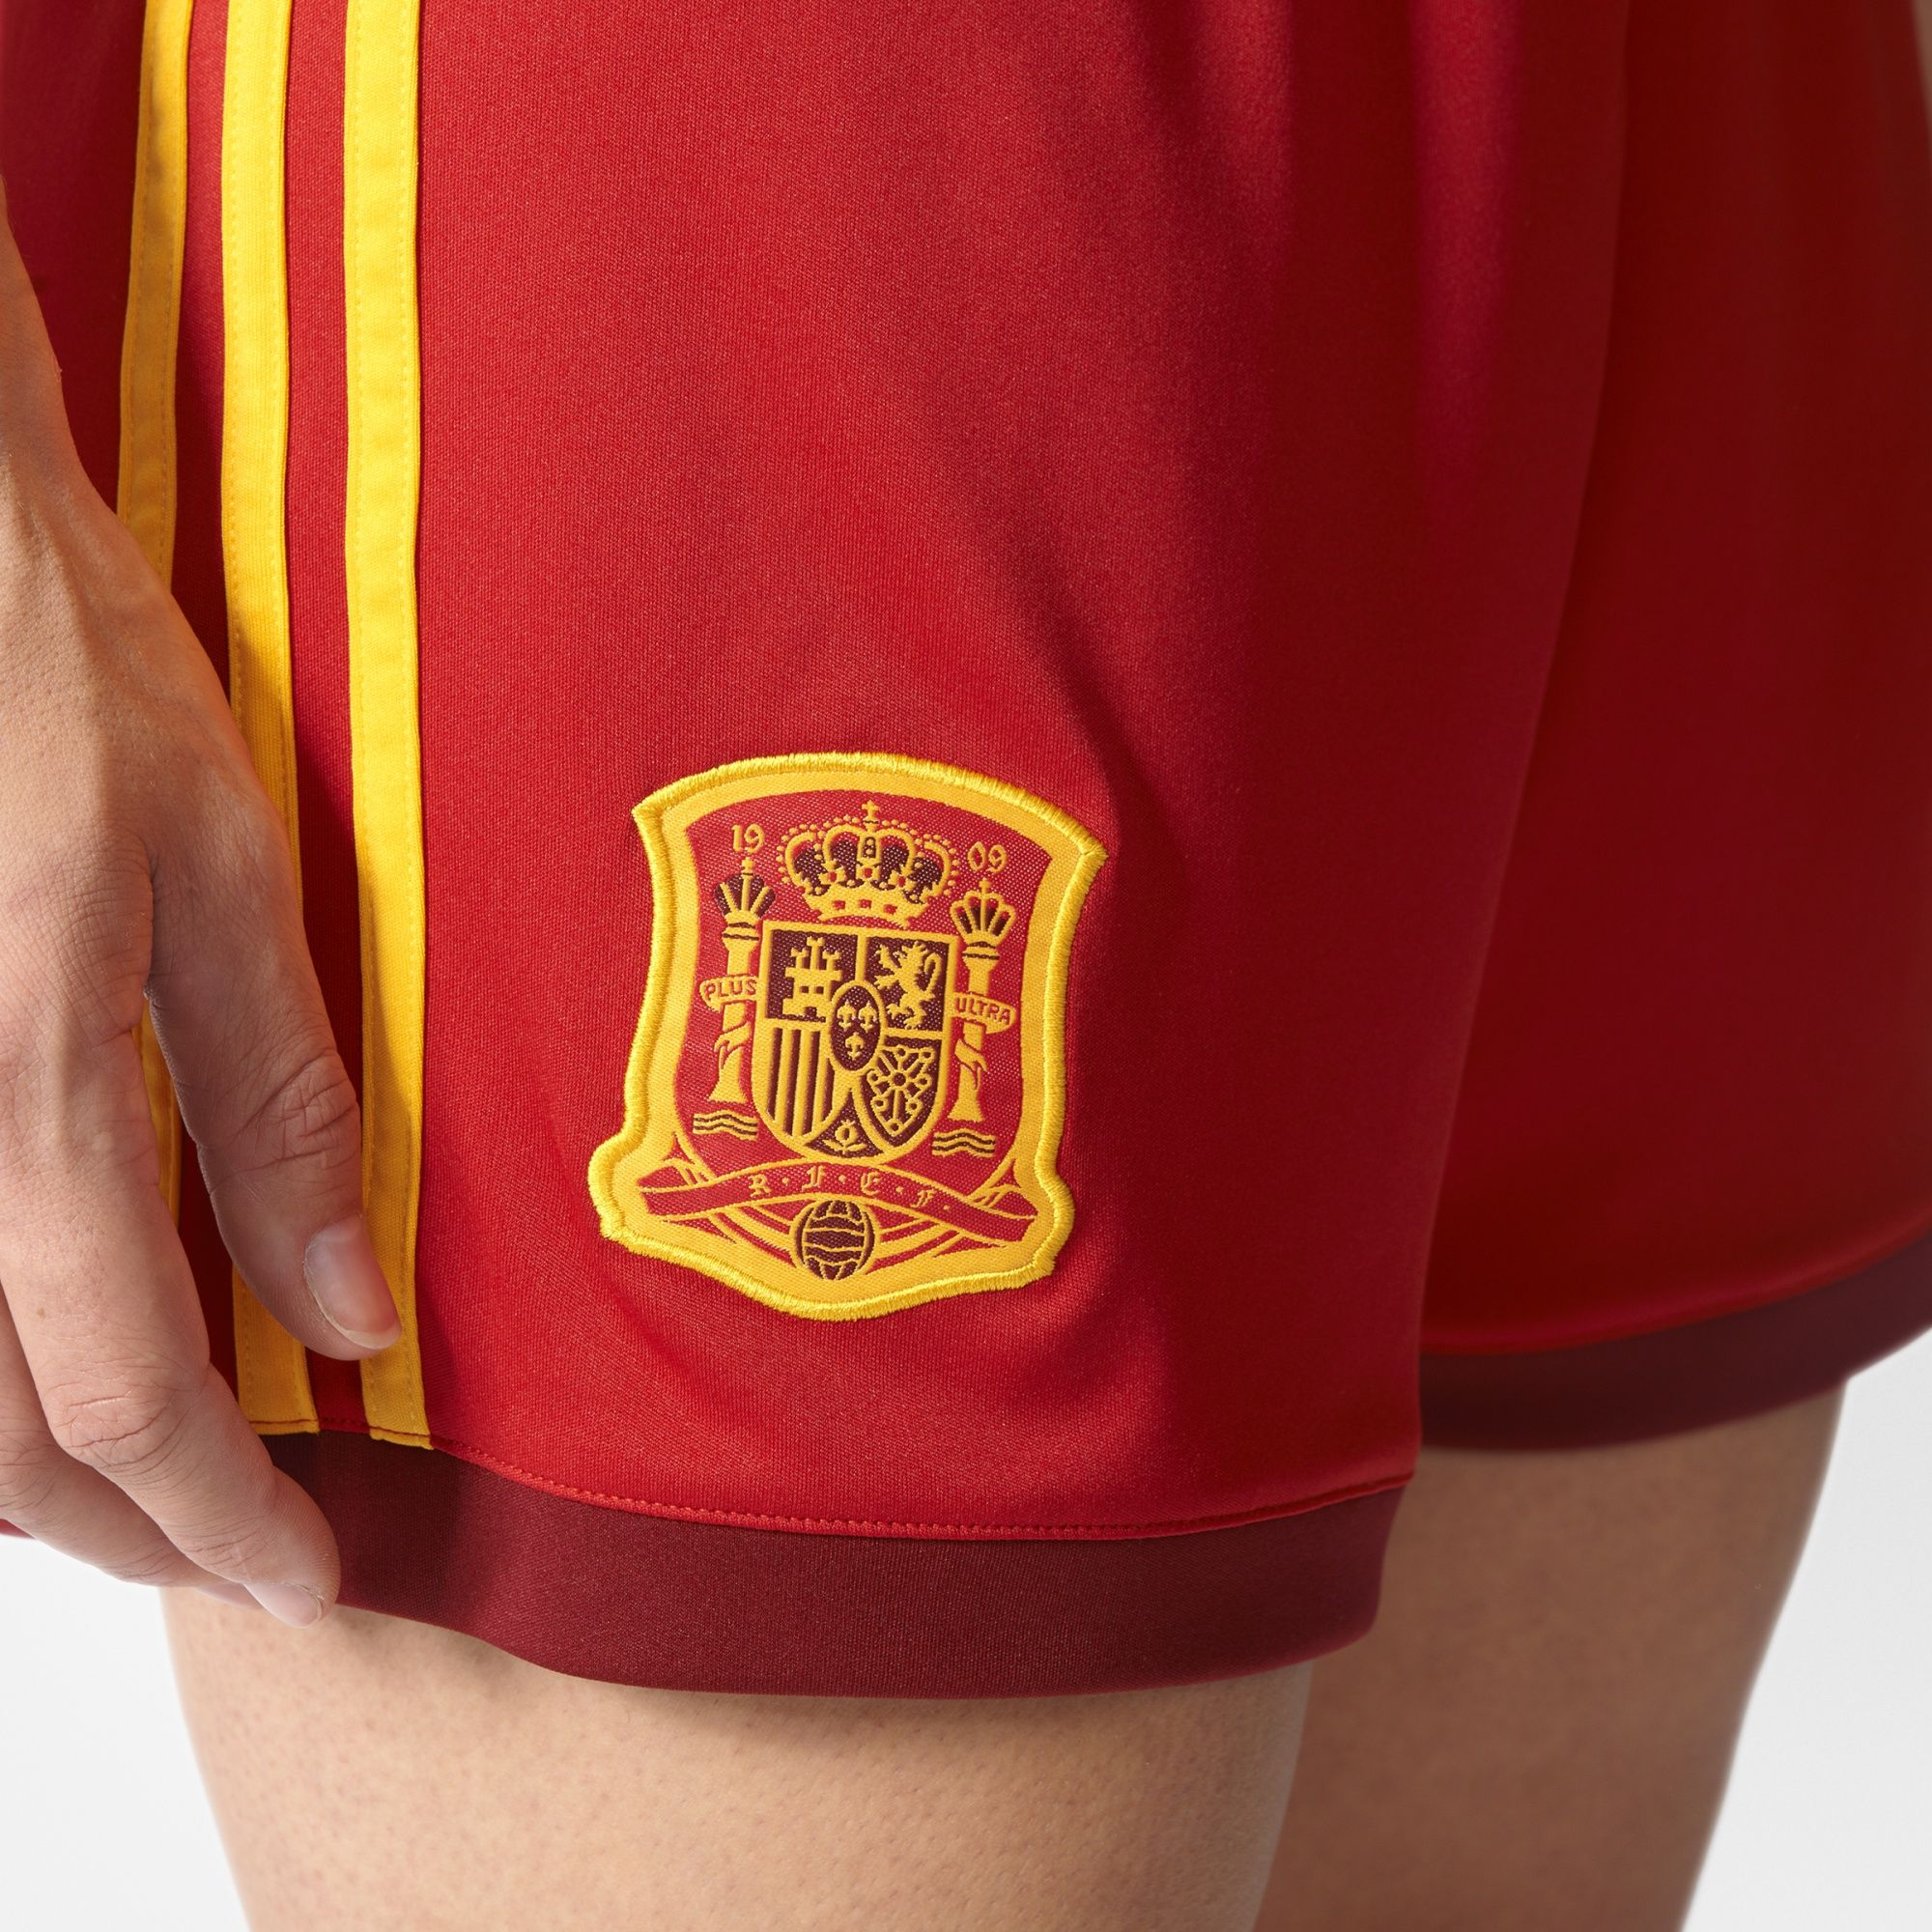 Домашняя форма женской сборной Испании 2017 Домашняя форма женской сборной  Испании 2017 ... 9a130e179bf